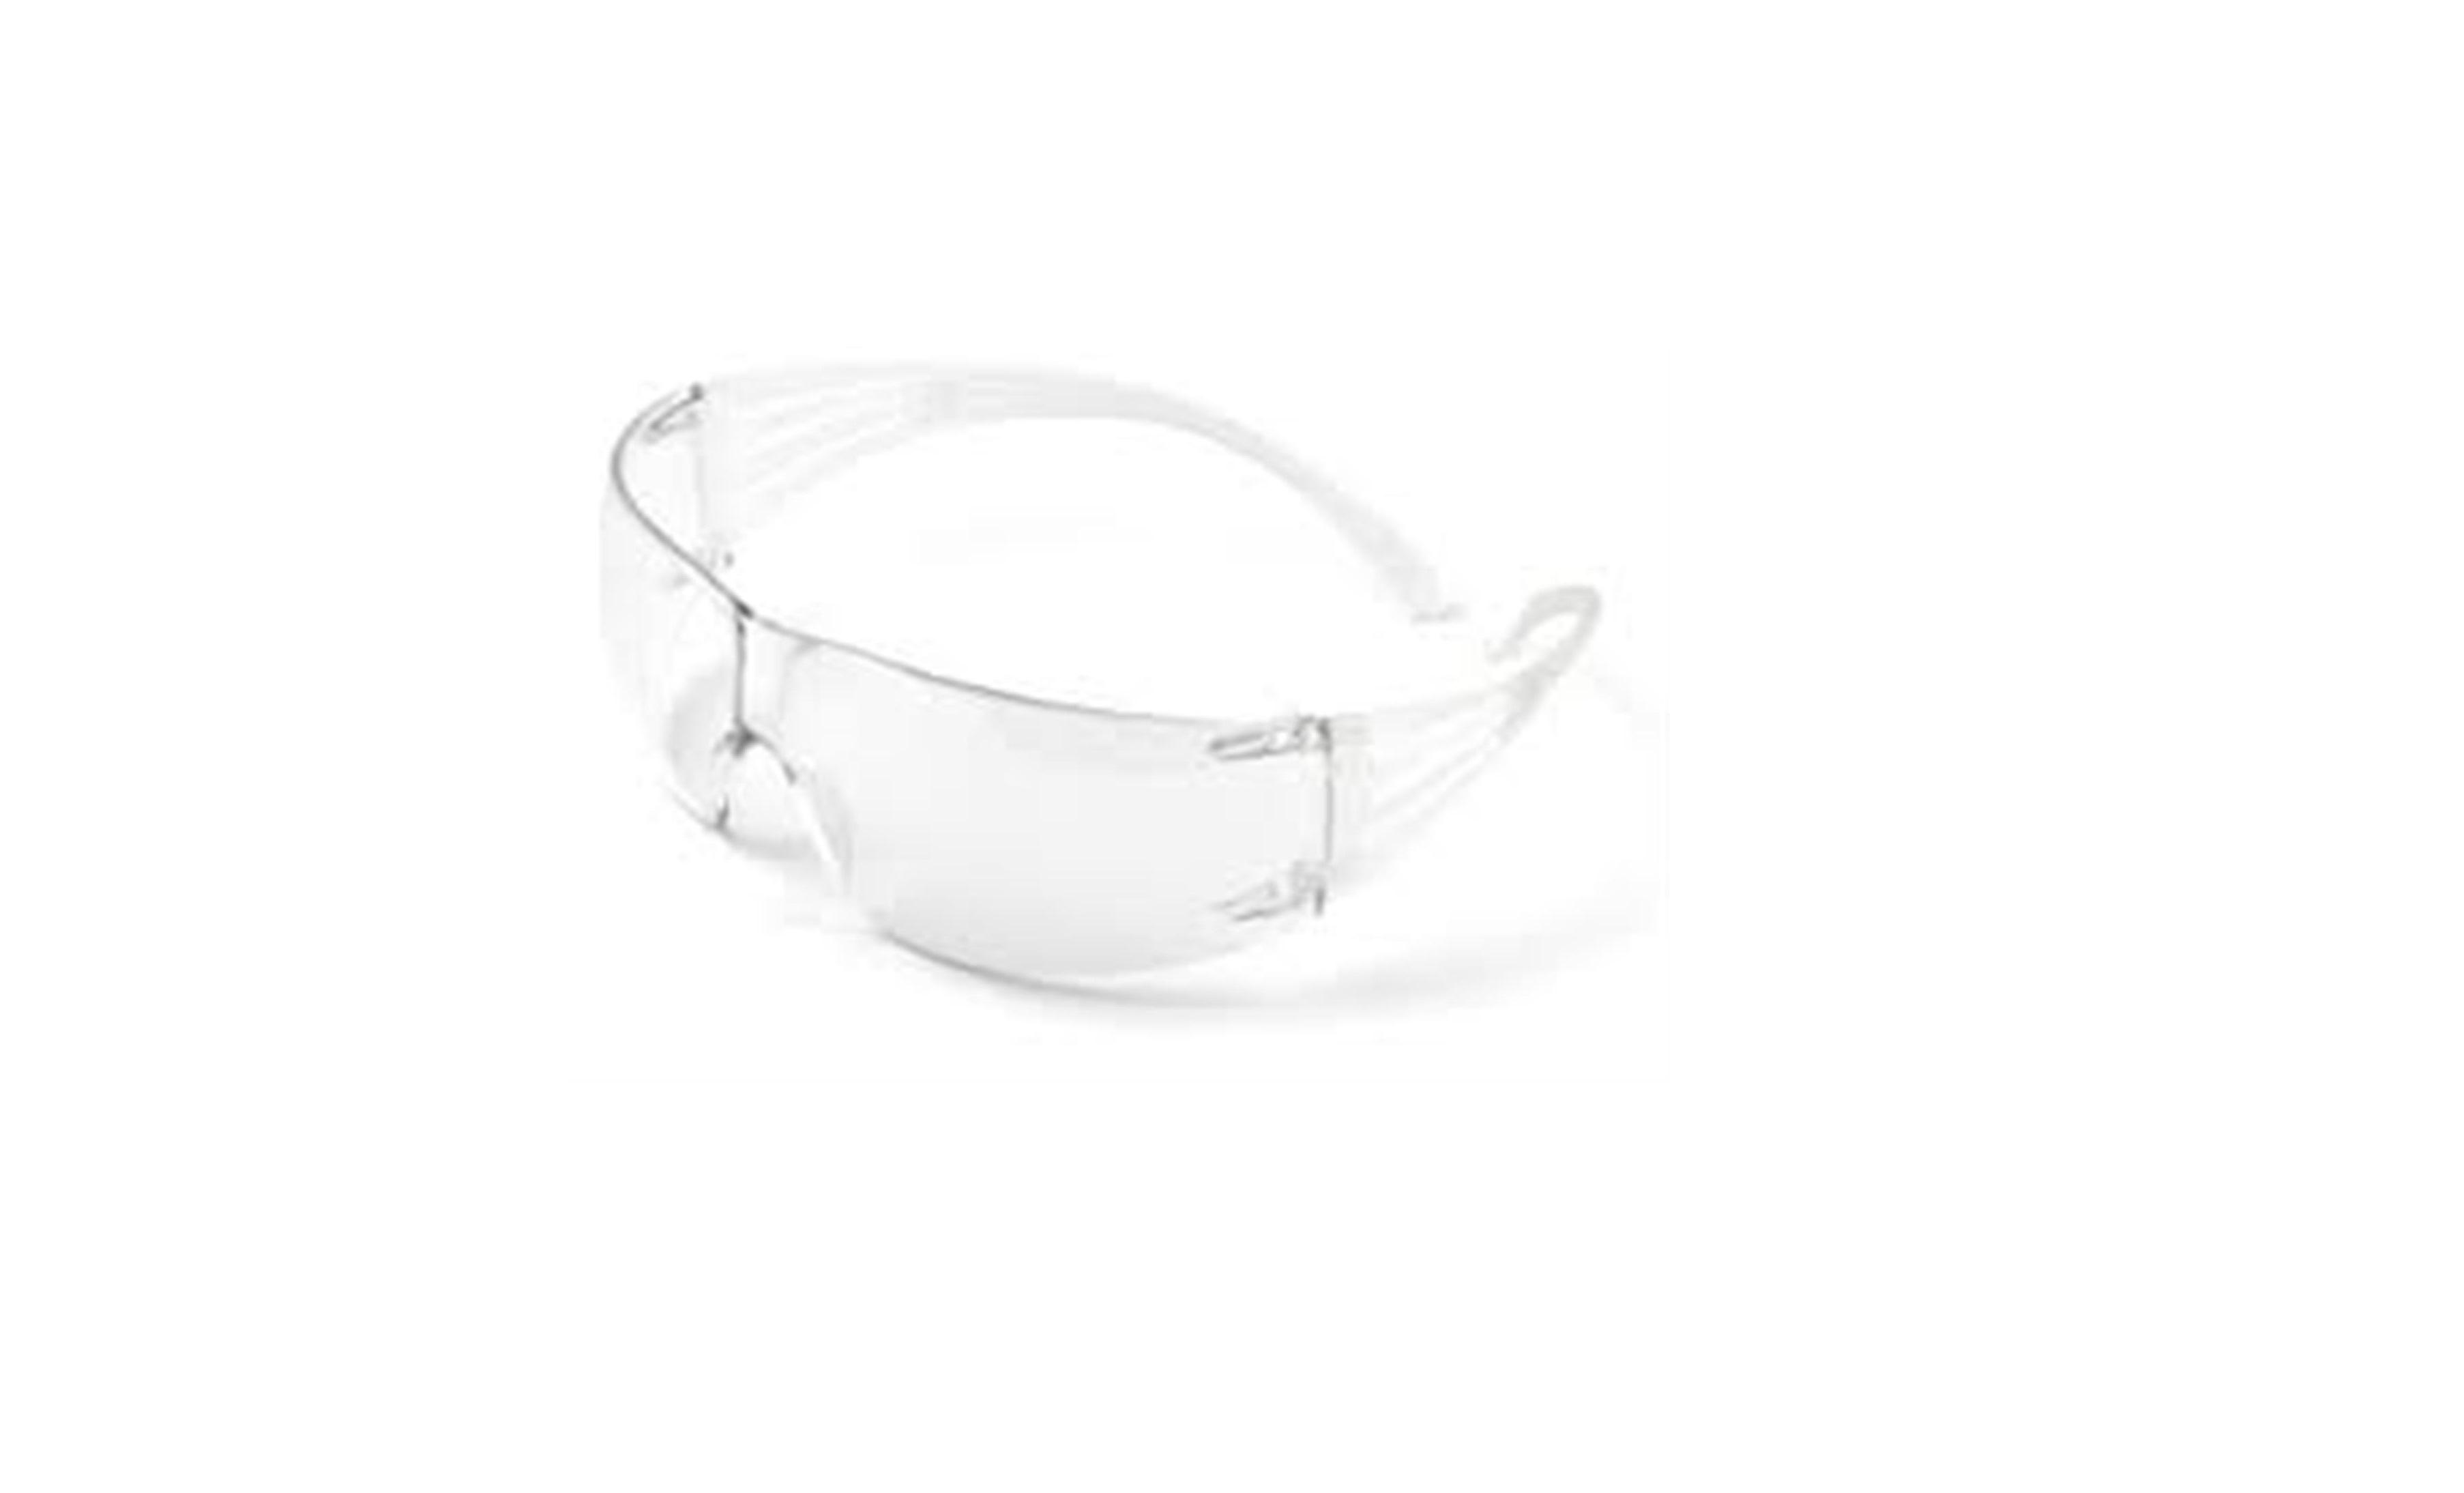 3M-SecureFit-Protective-Eyewear-AJACOVIDES